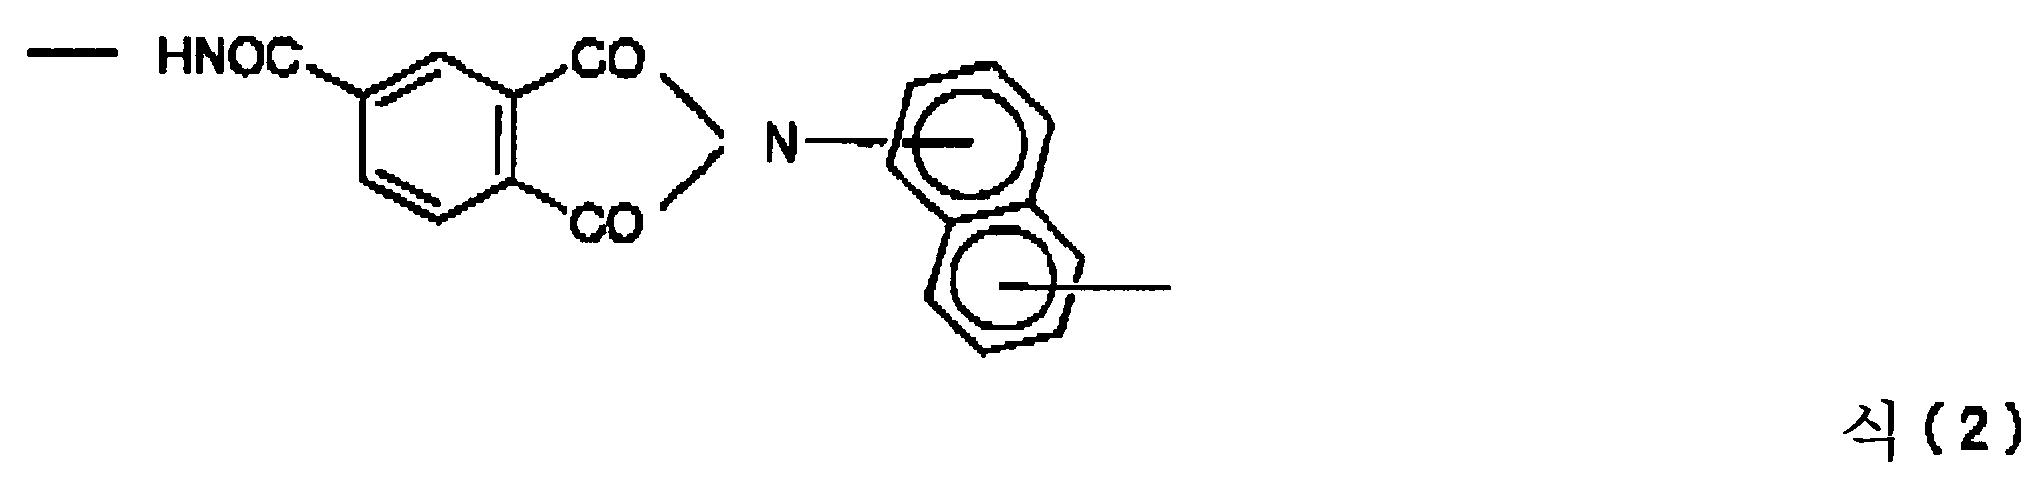 Figure 112001018942212-pat00002